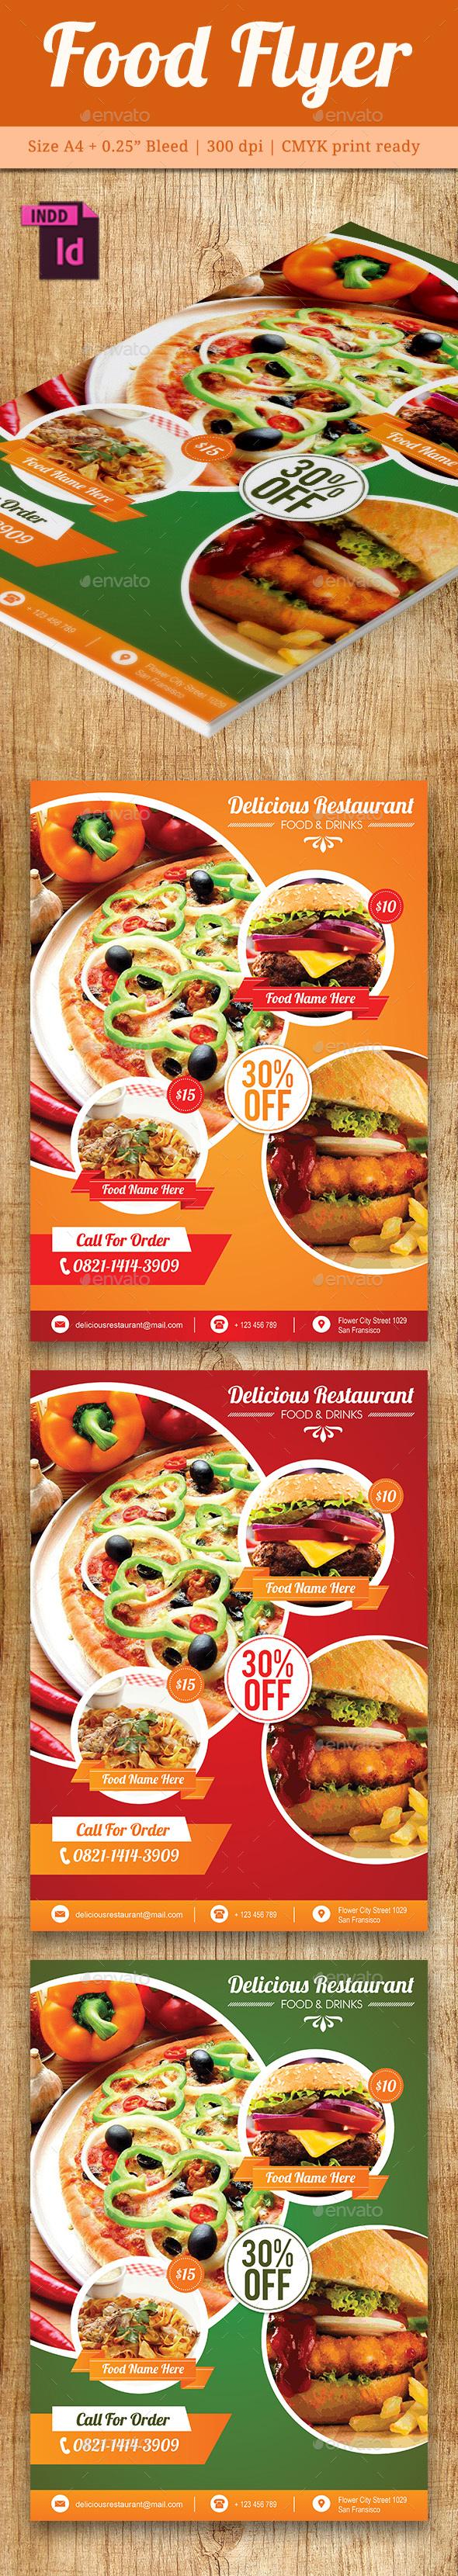 Food Flyer Template Vol. 7 - Restaurant Flyers